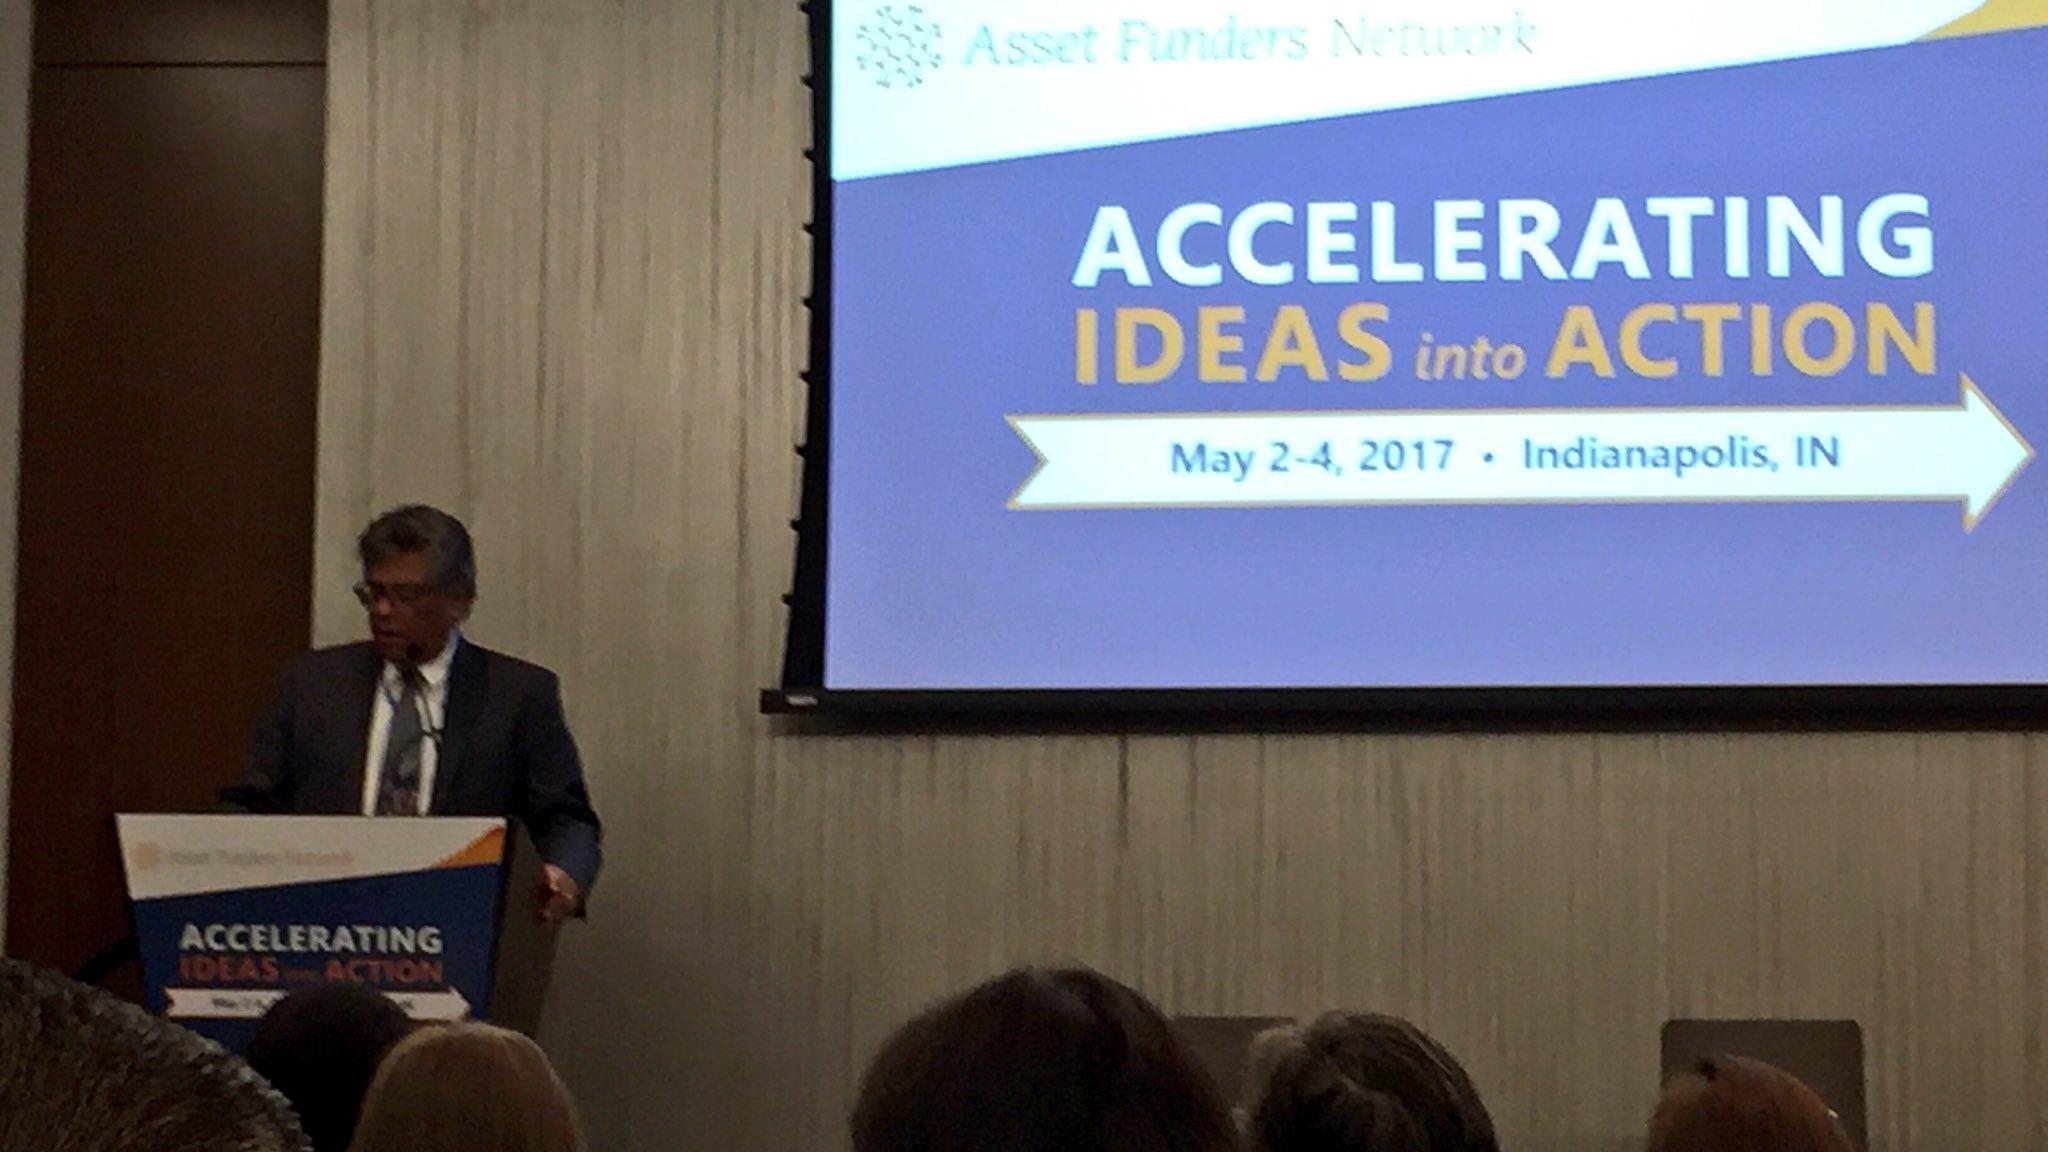 Exec Dir of @AssetFunders, Joseph Antolin, highlighting racial & women's #wealthgap, philanthropy role to bring #ideasintoaction https://t.co/BIrmZ2uFl7